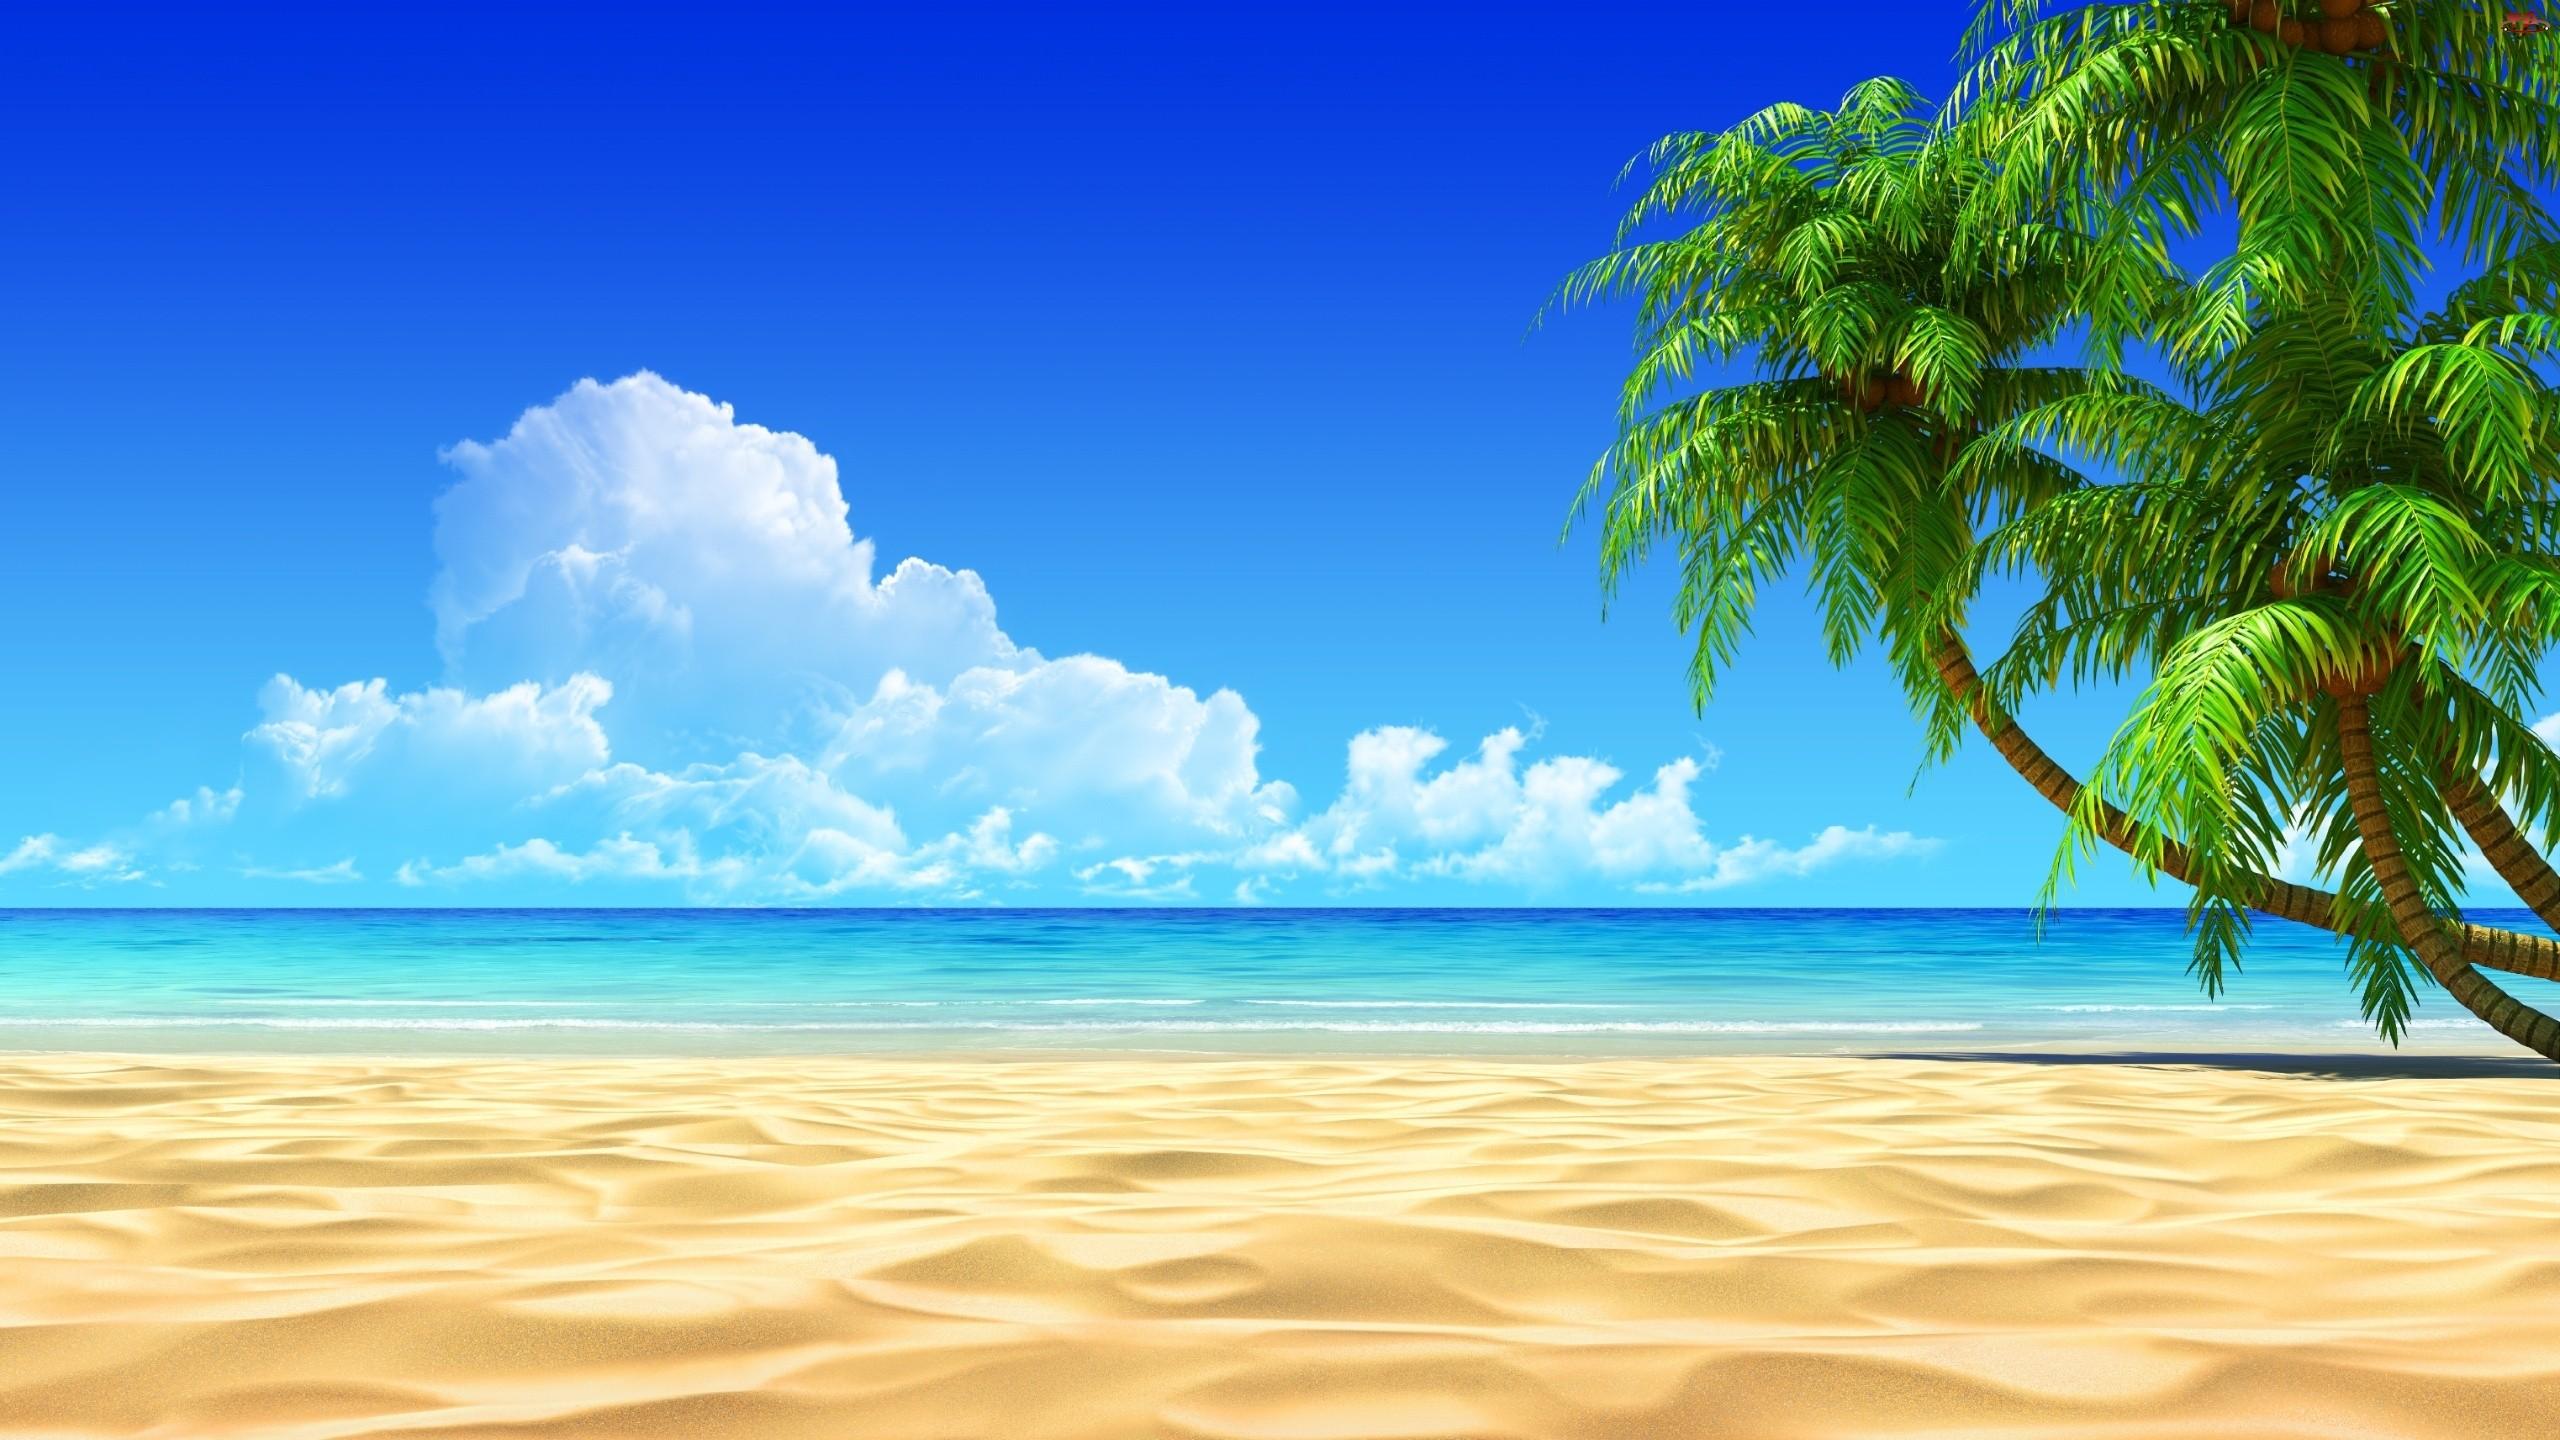 hd beach wallpaper  u00b7 u2460 download free amazing backgrounds